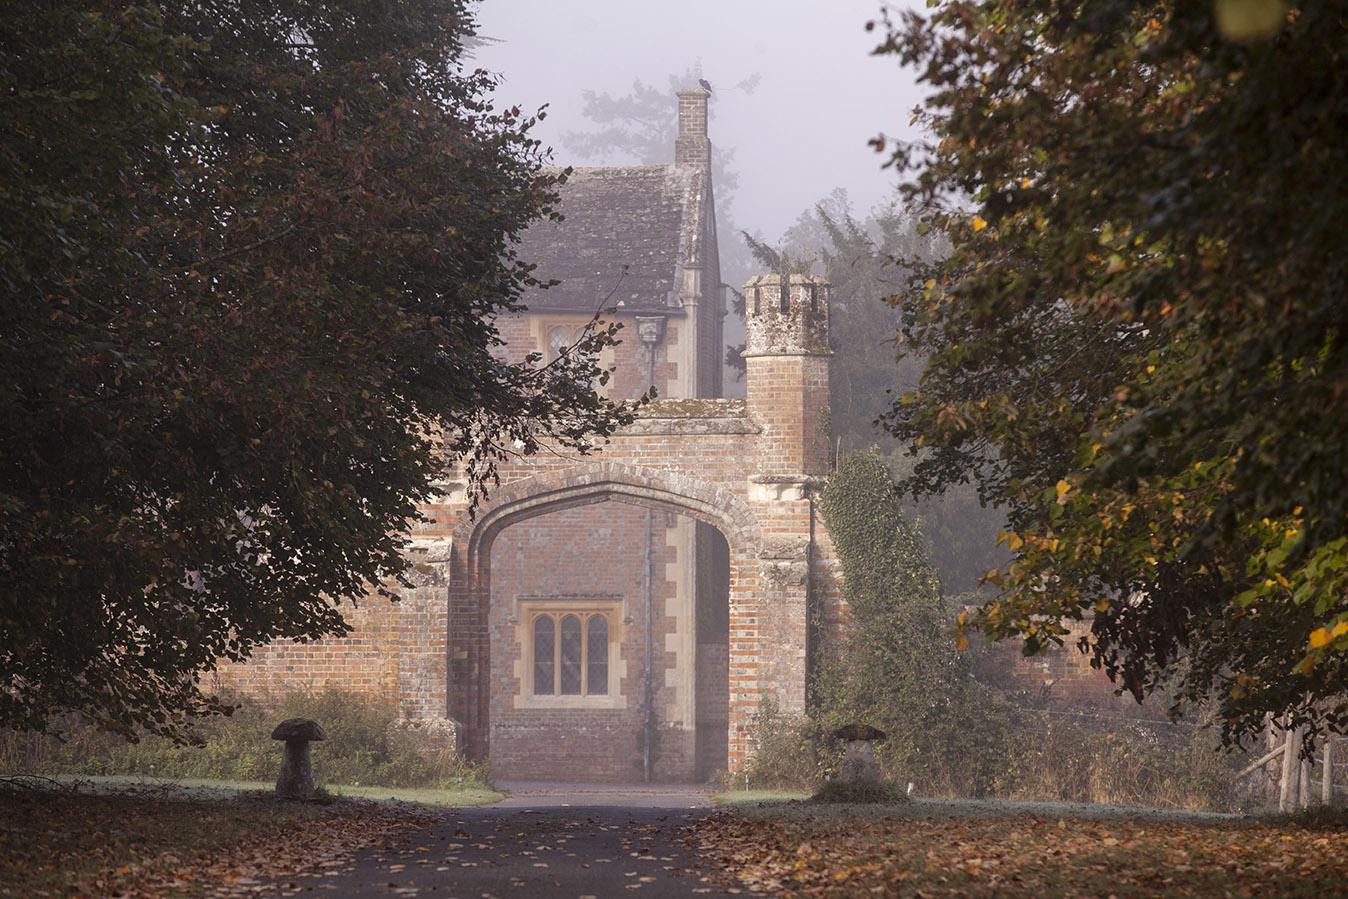 w_gardenhouse004_estate_fog2018_copyright_jtdenyerphoto.jpg